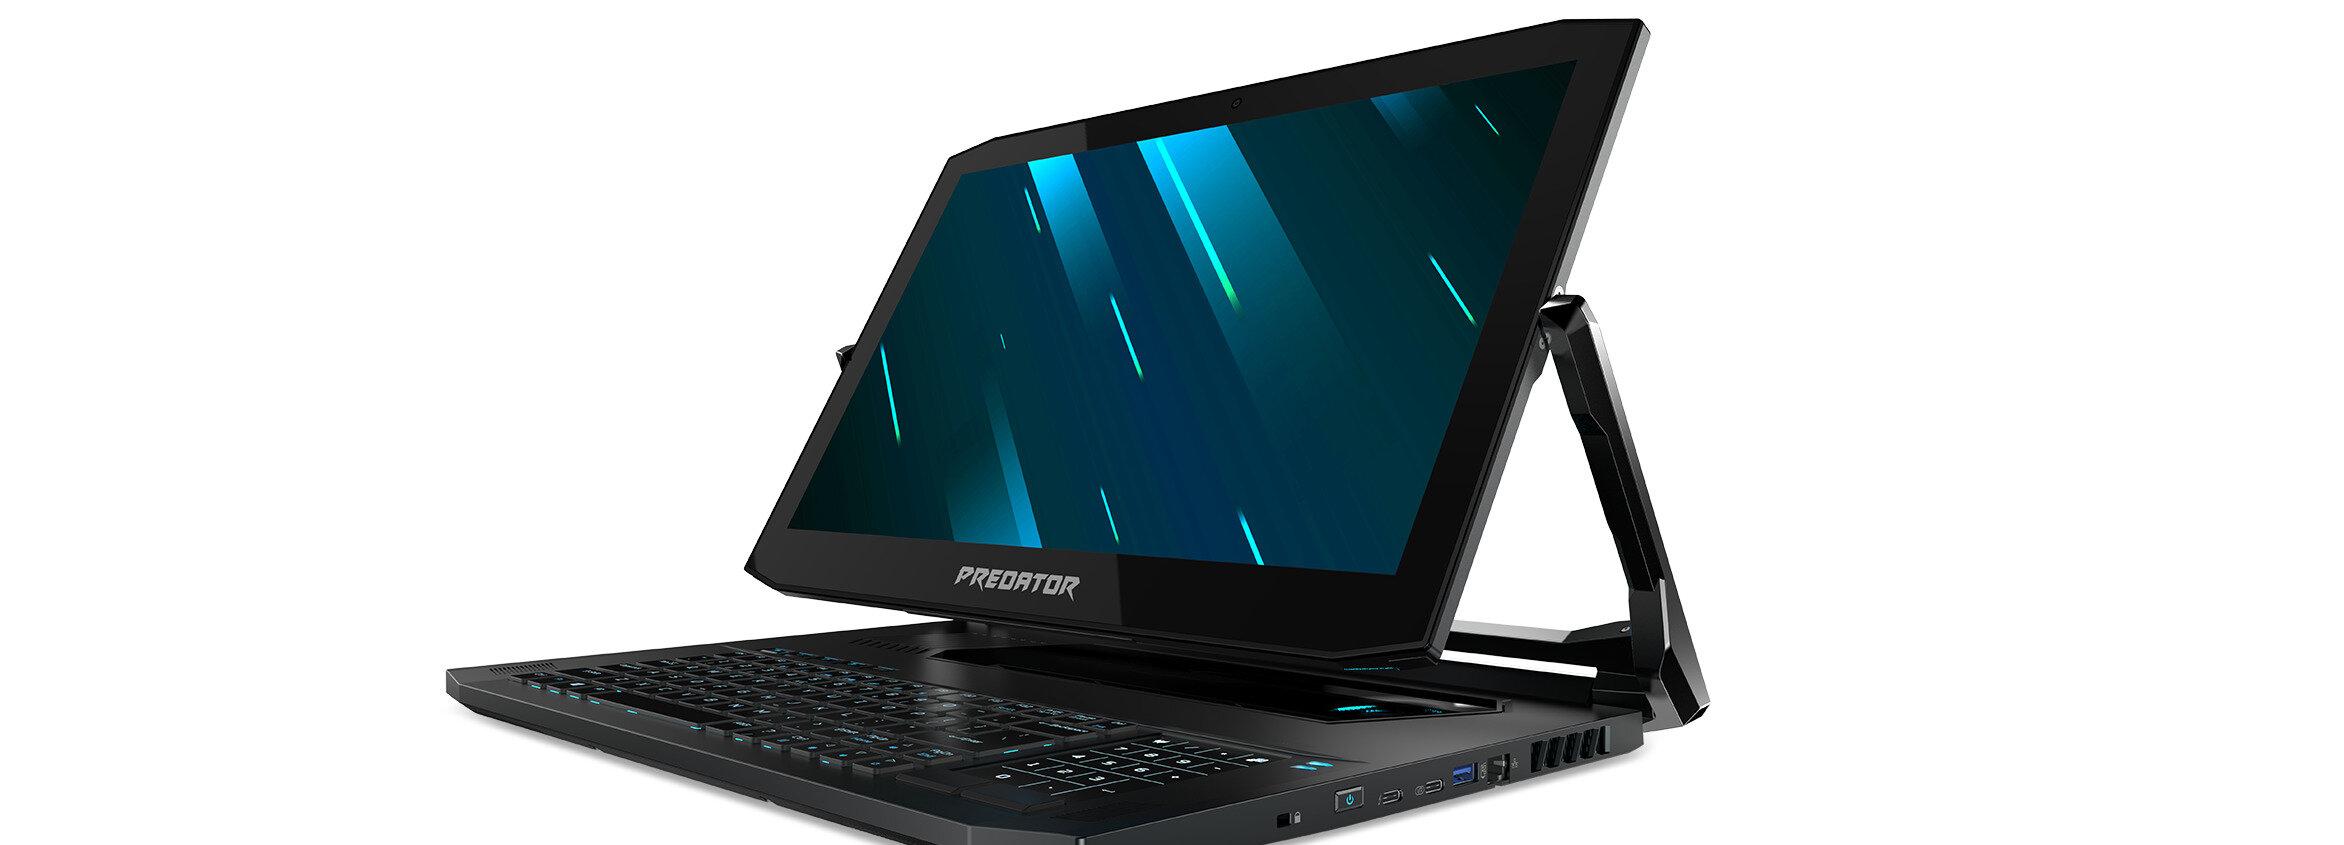 Acer Predator Triton 900 et ASUS ROG Mothership : deux portables hybrides avec GeForce RTX 2080